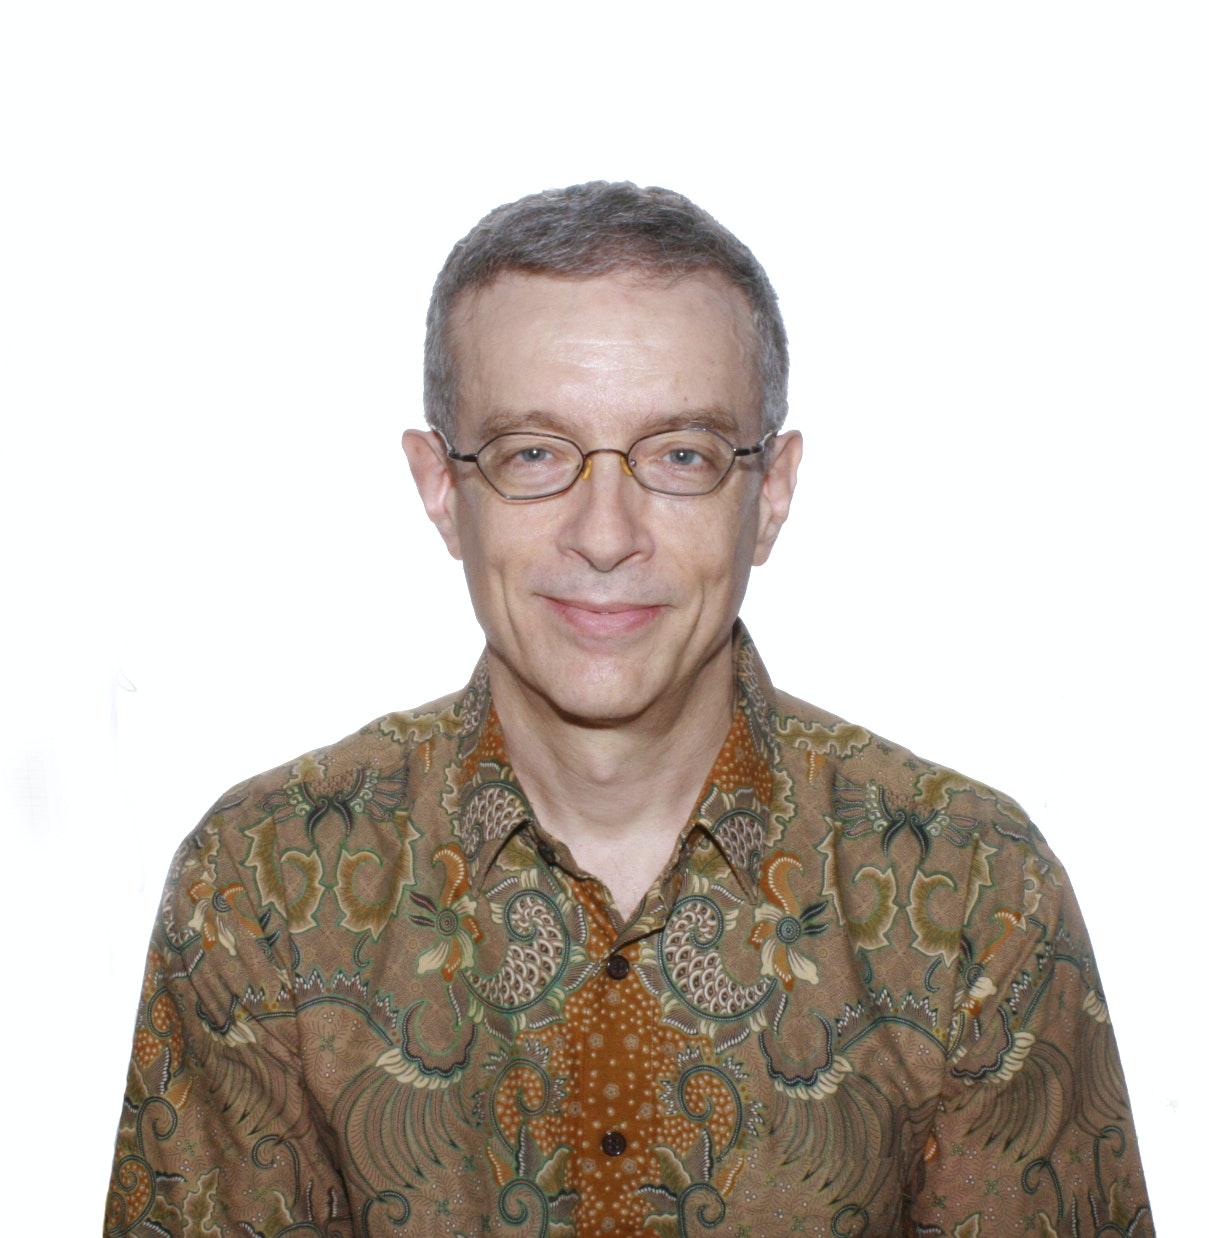 Laguna Beach Trustee. Michael Morris